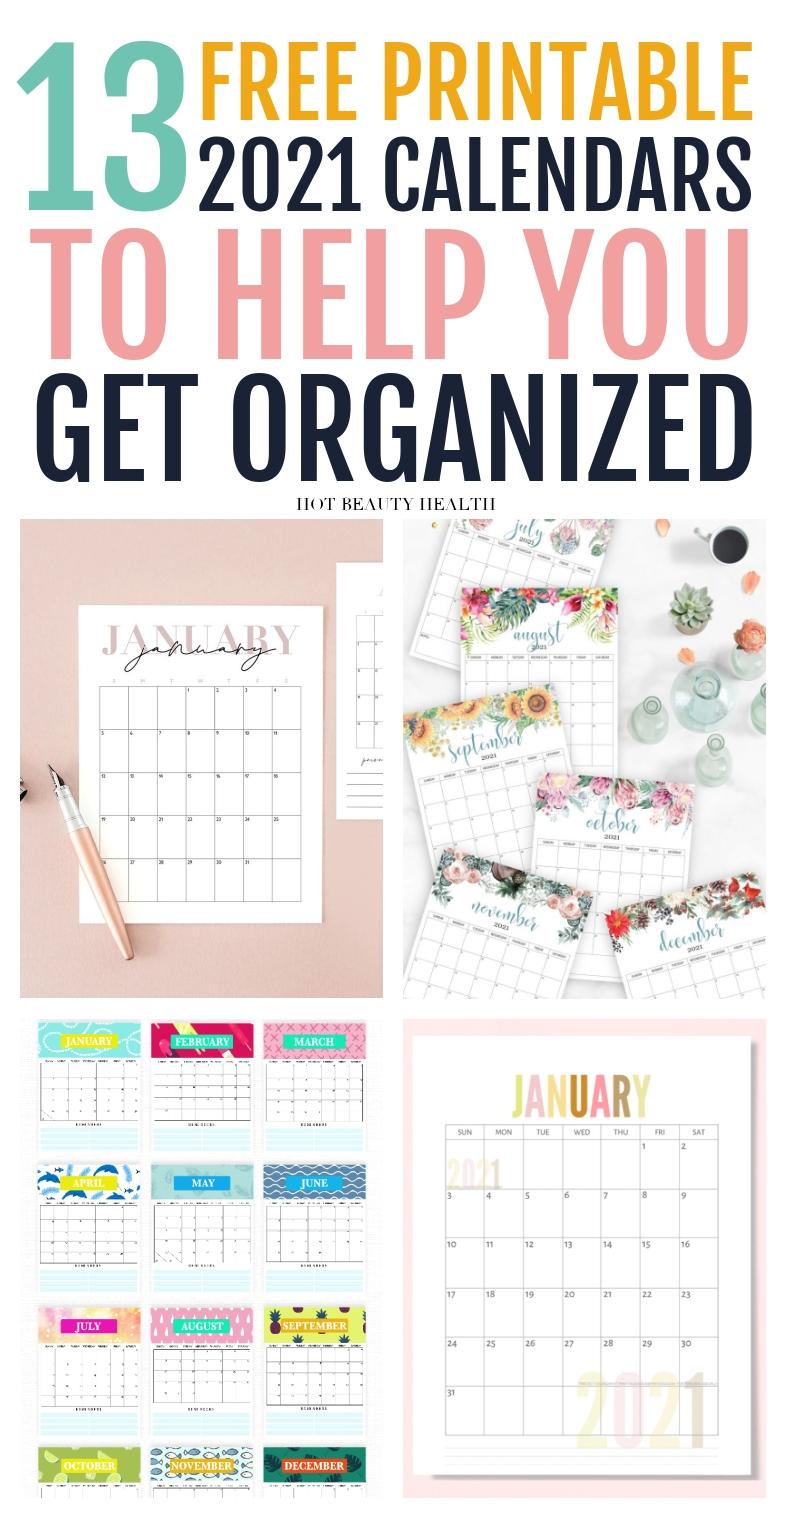 13 Cute Free Printable Calendars For 2021 You'Ll Love - Hot